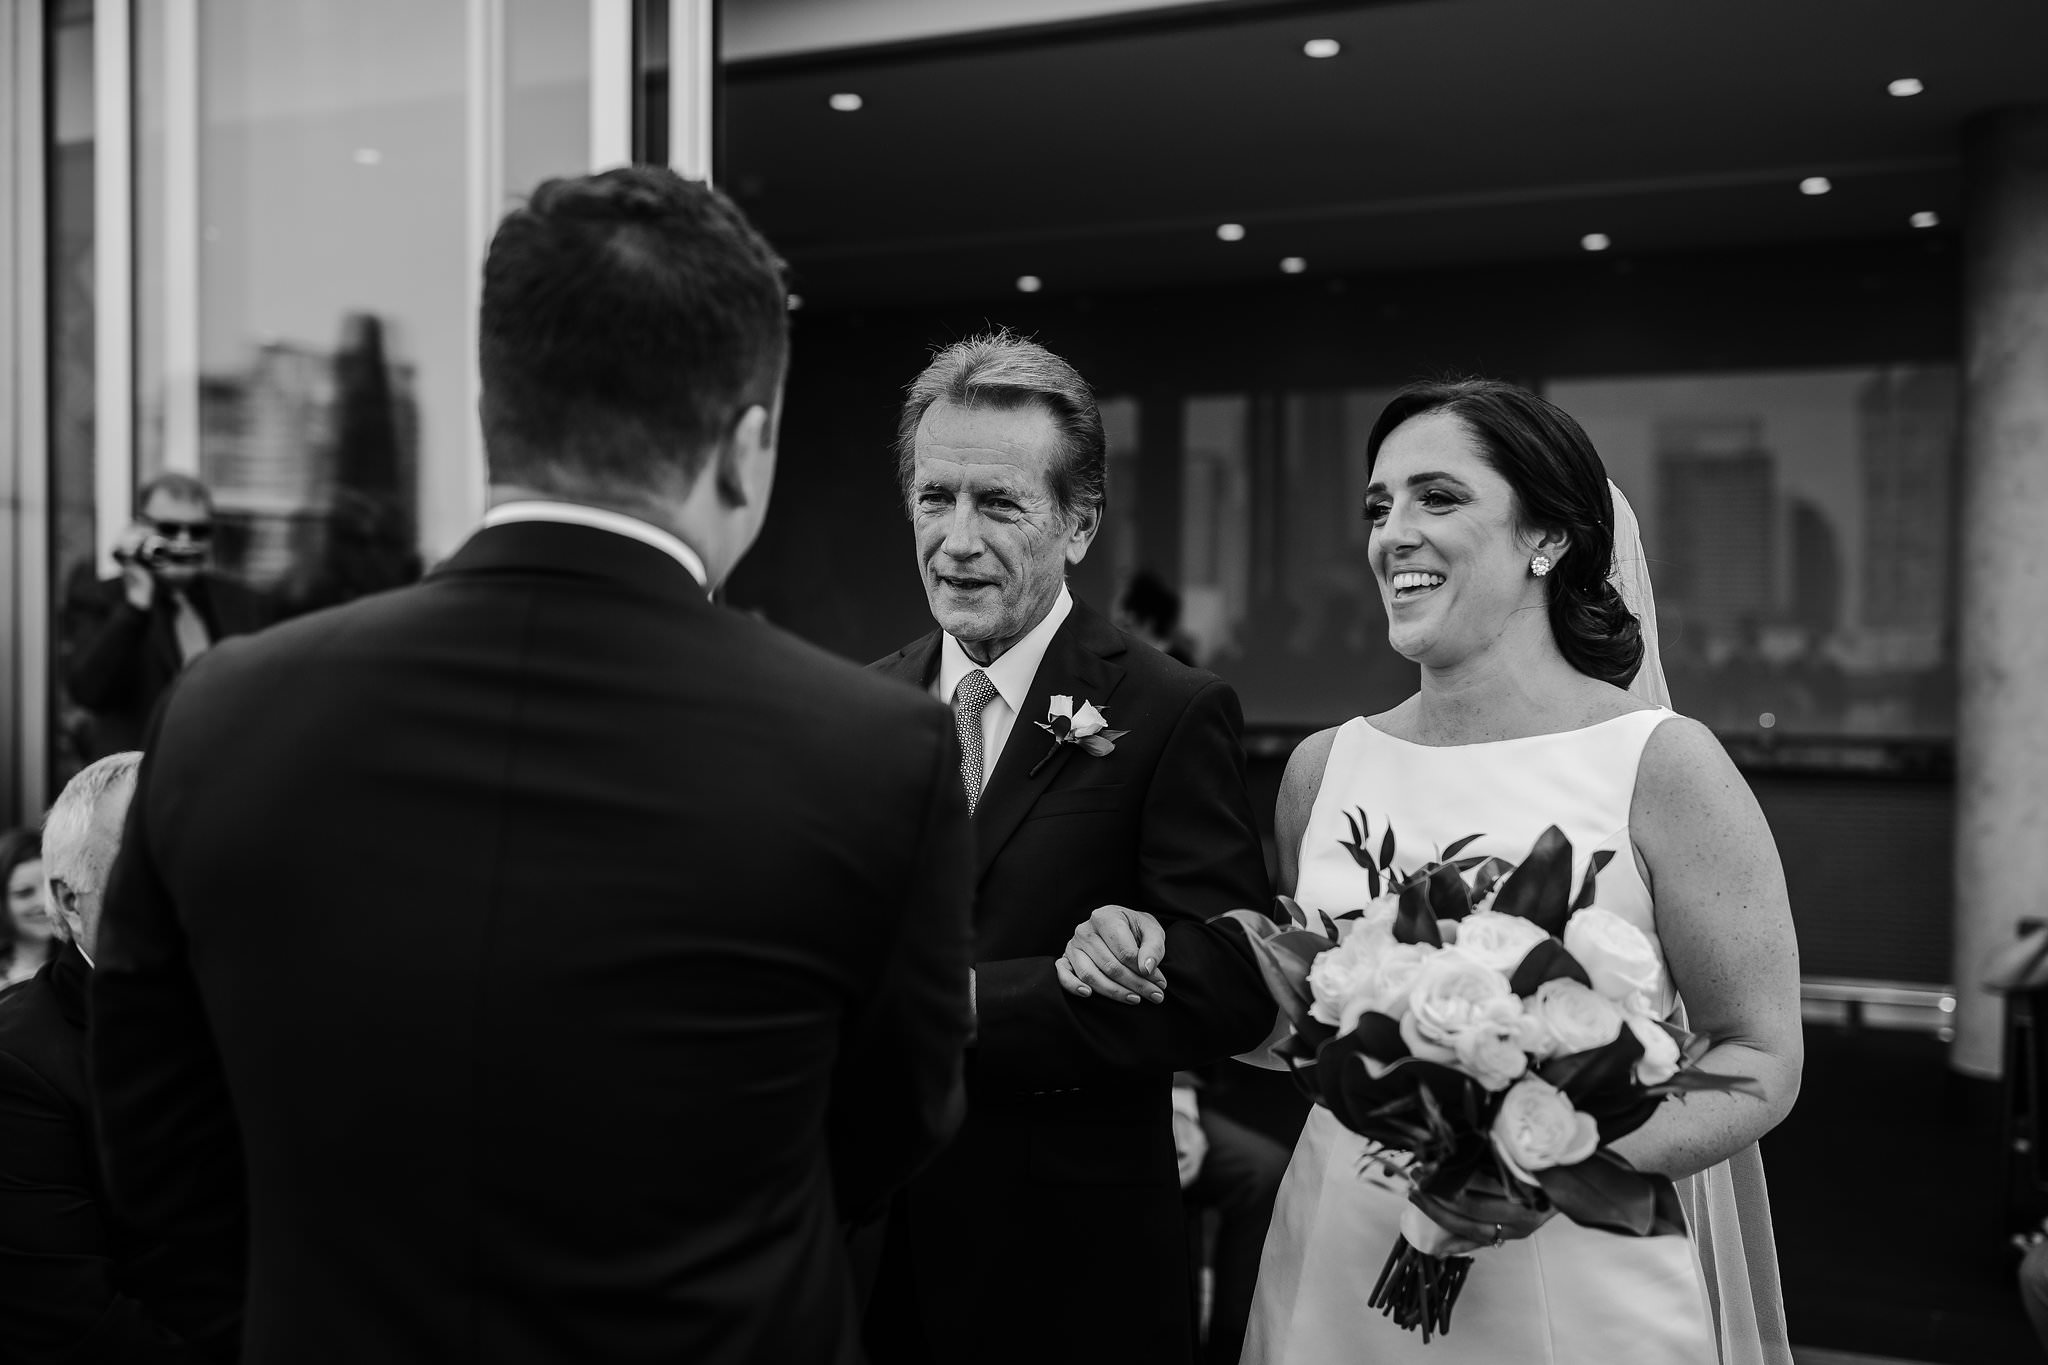 Cristin Rob Thompson Hotel Wedding Photos 502 - Thompson Hotel Wedding Photos